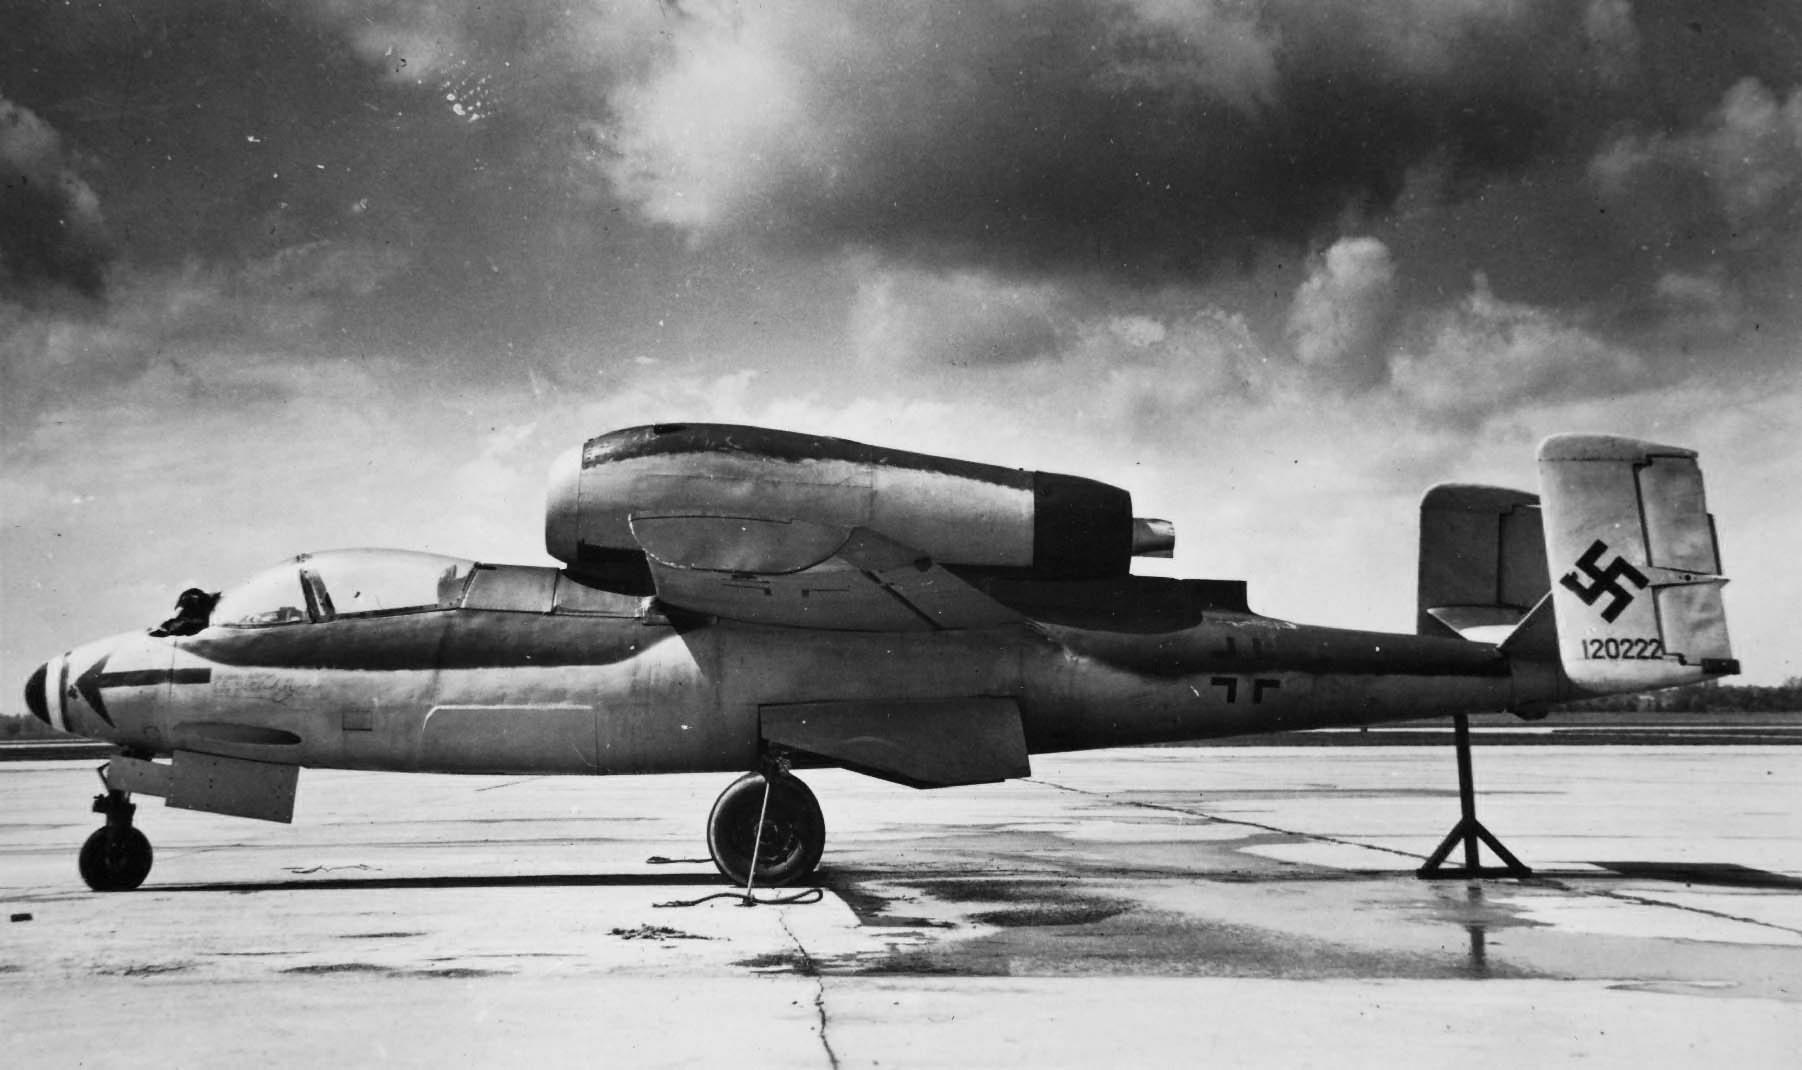 Captured He 162 A-2 ex I./JG 1 W.Nr. 120222. Wright Field 1945